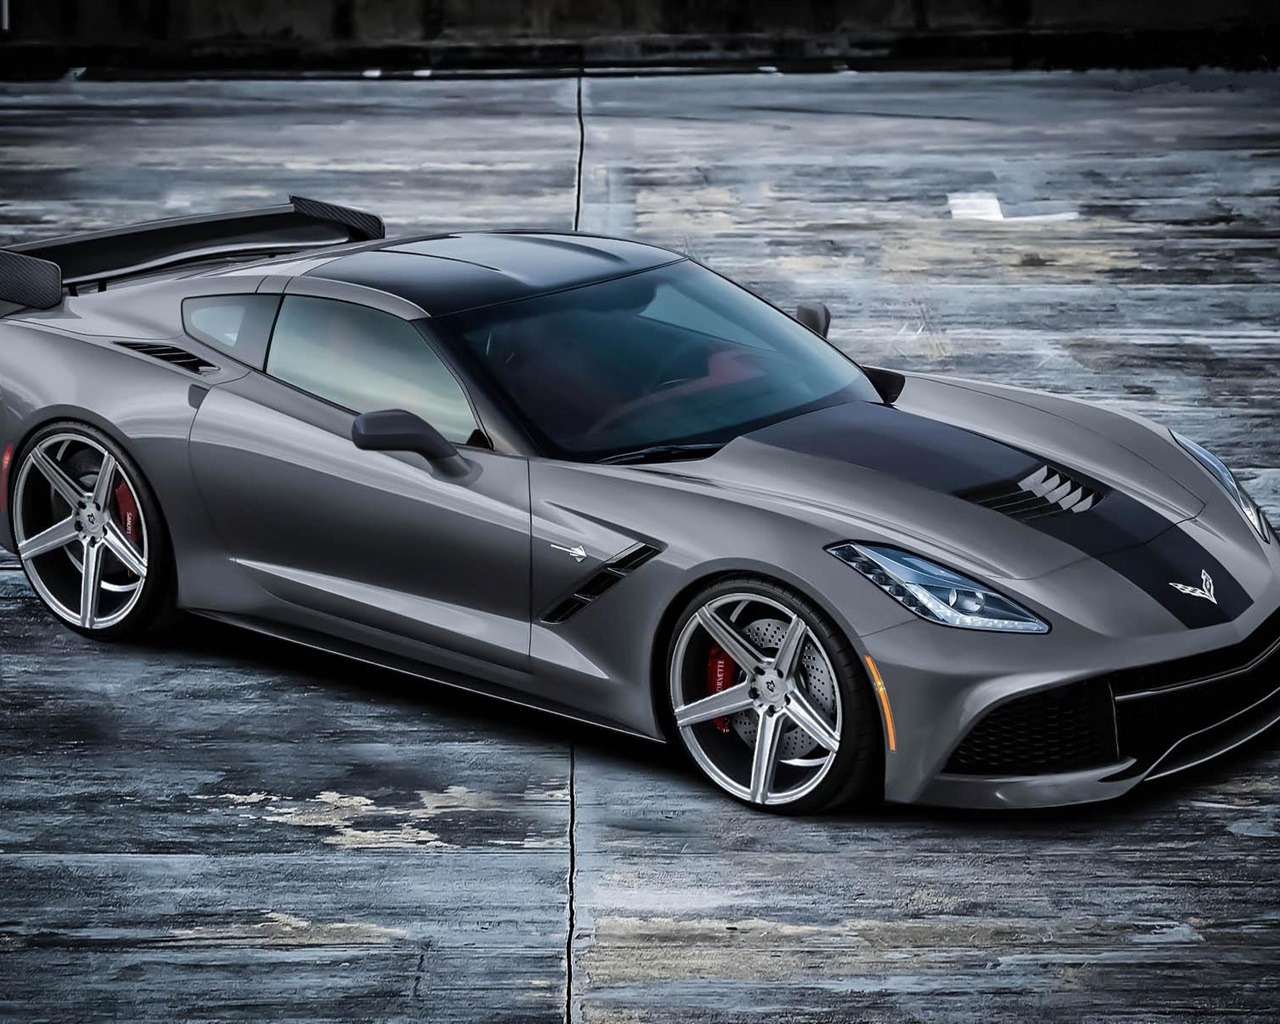 Corvette C7 Stingray grau supercar Hintergrundbilder   1280x1024 1280x1024